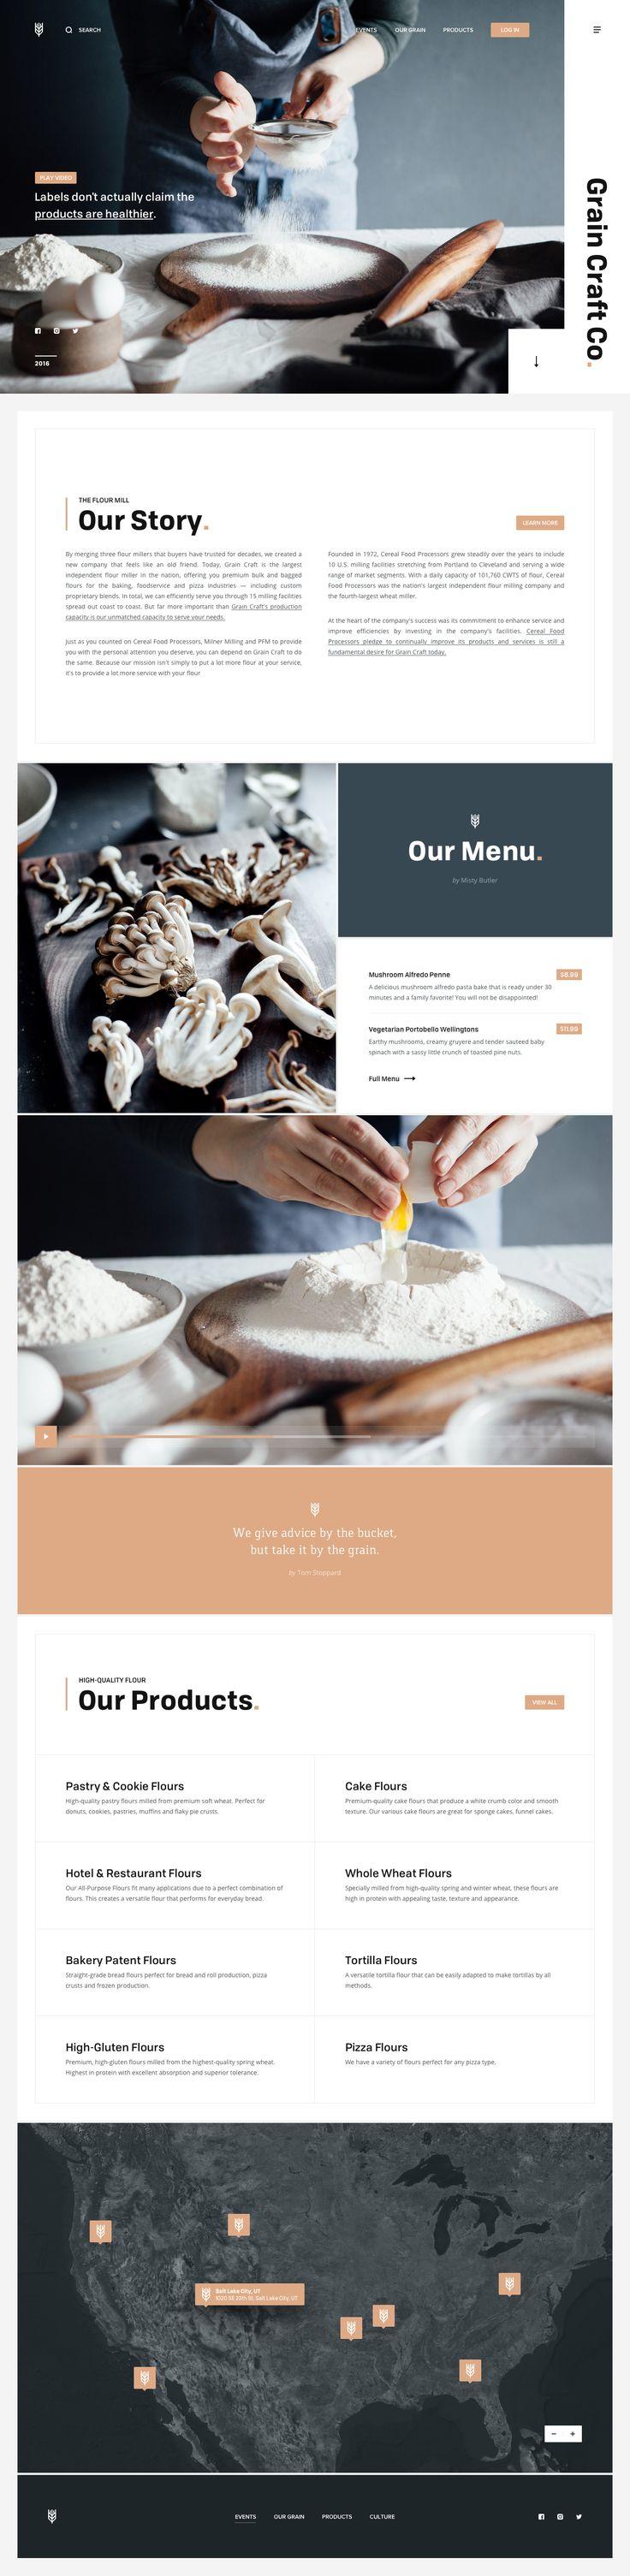 Grain Craft Co. Concept Food Web Design